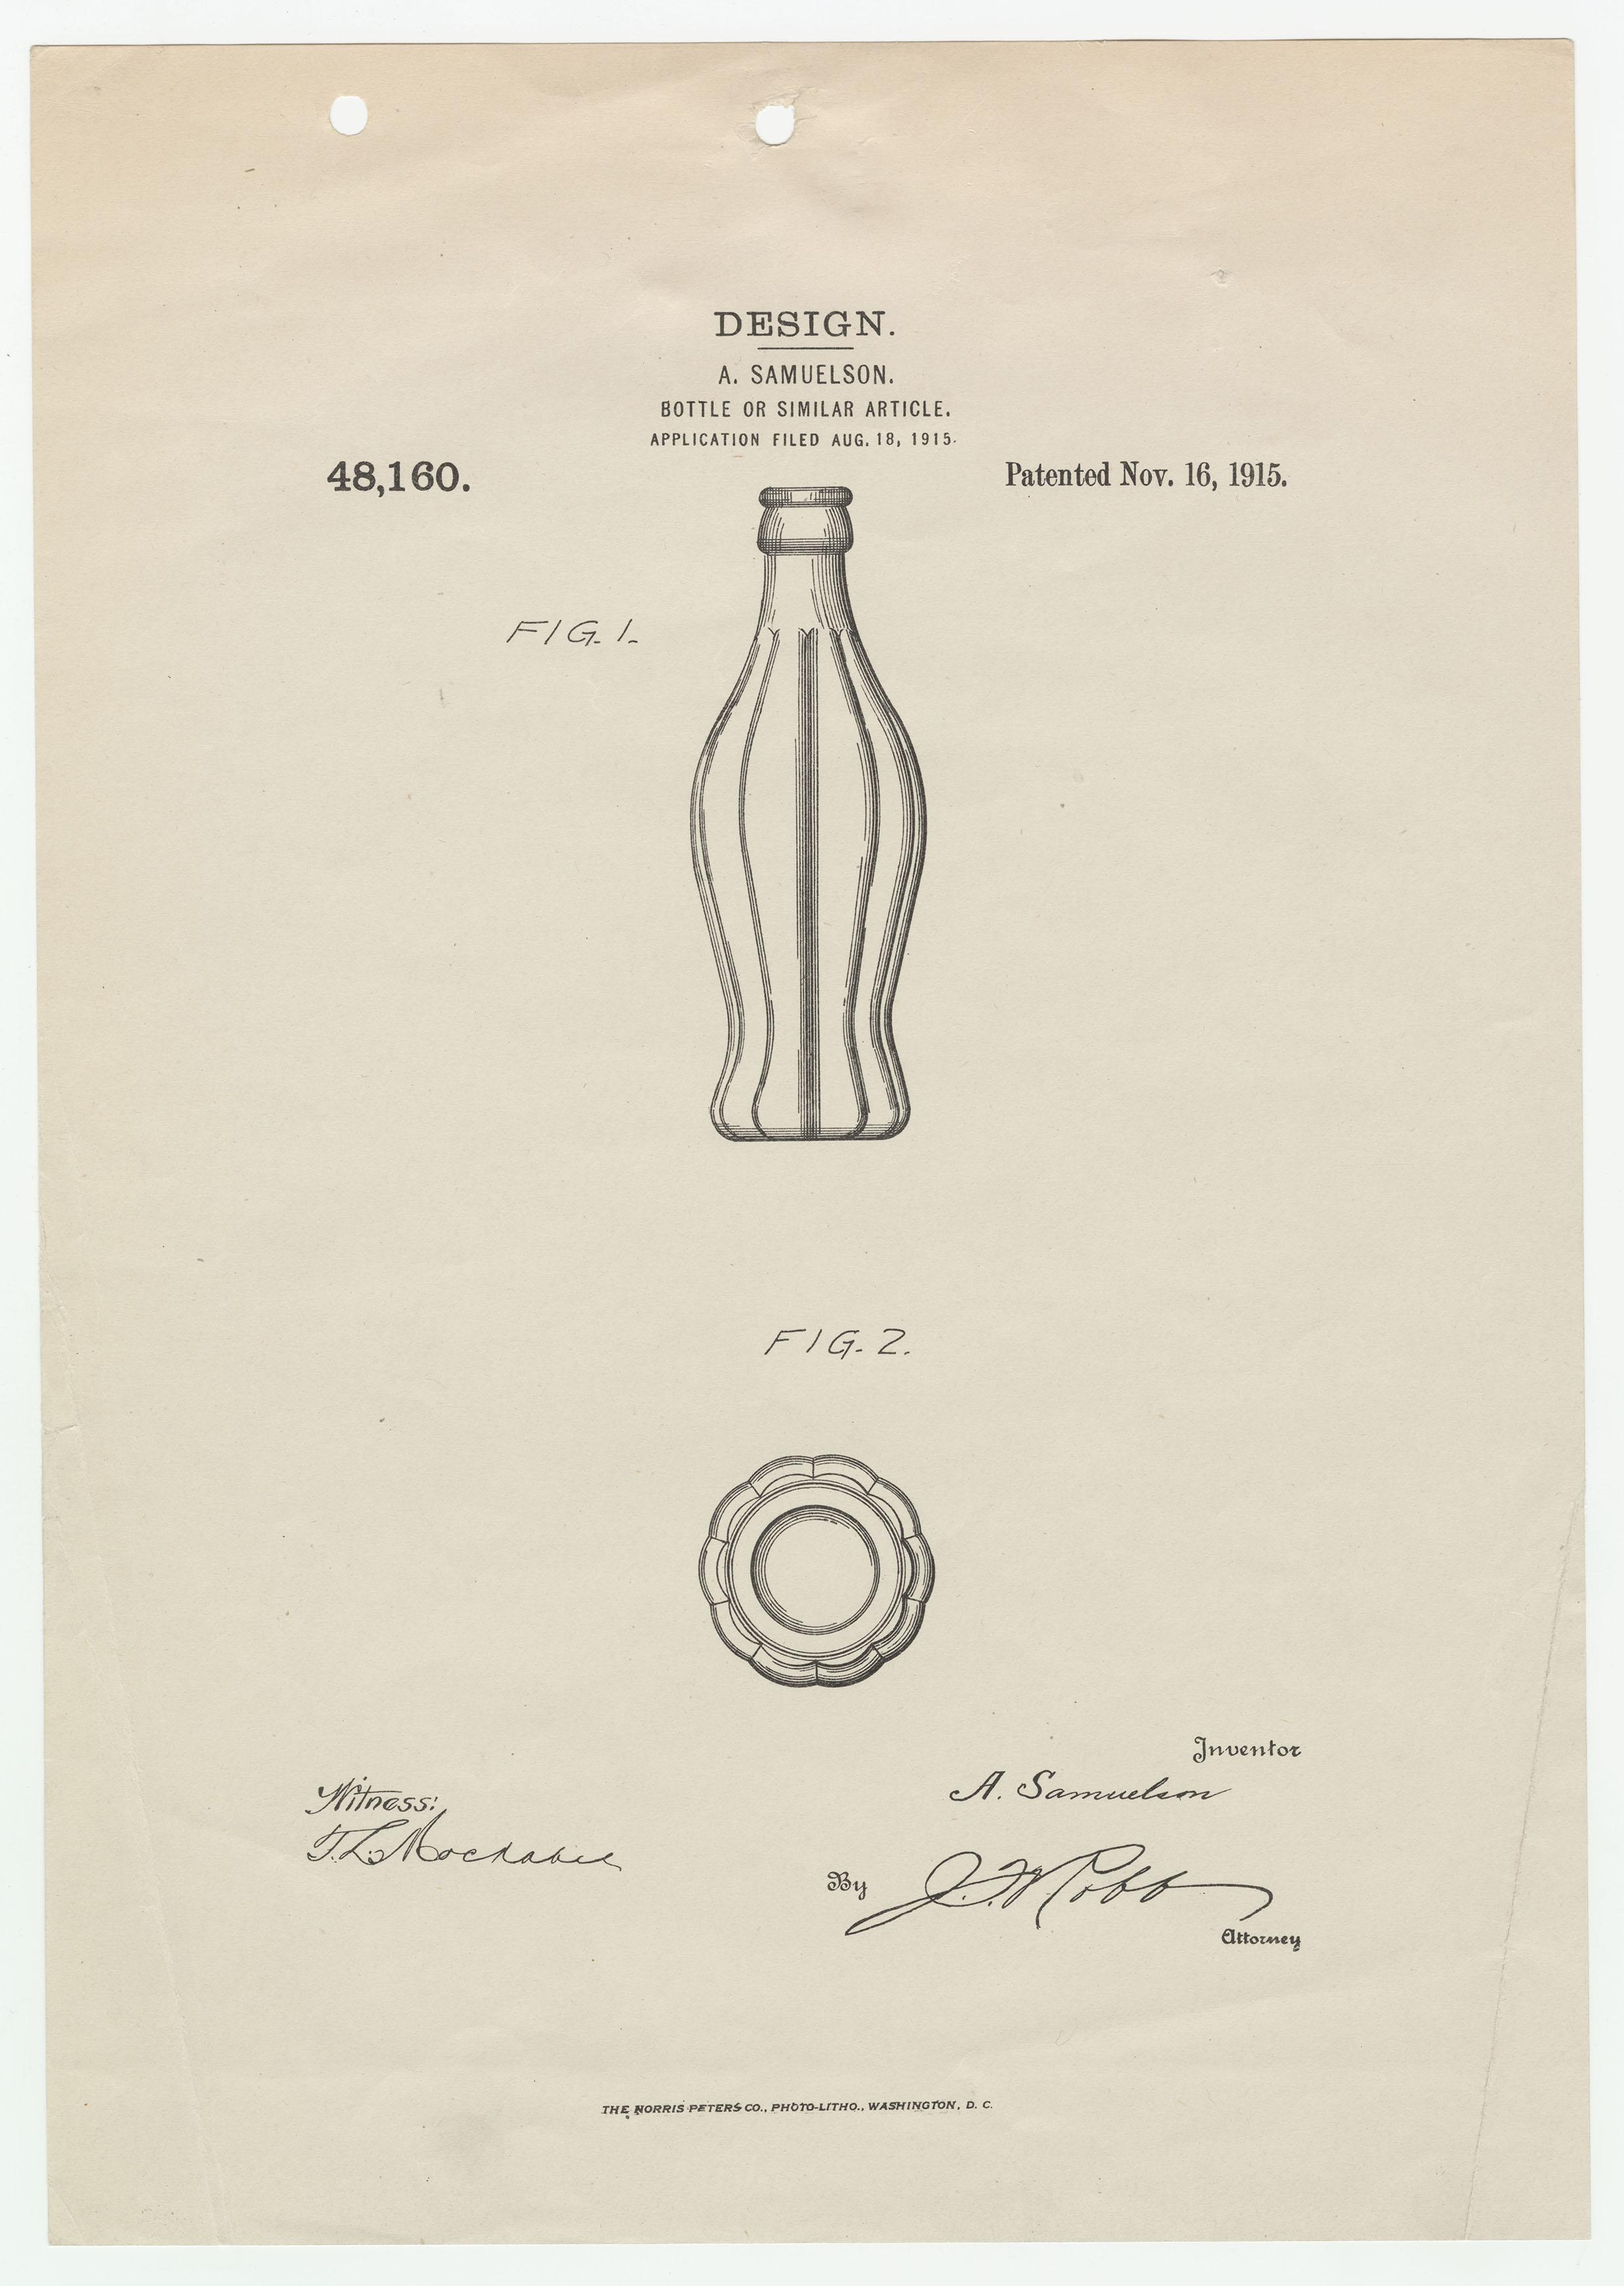 Coca-Cola bottle patent, 1915